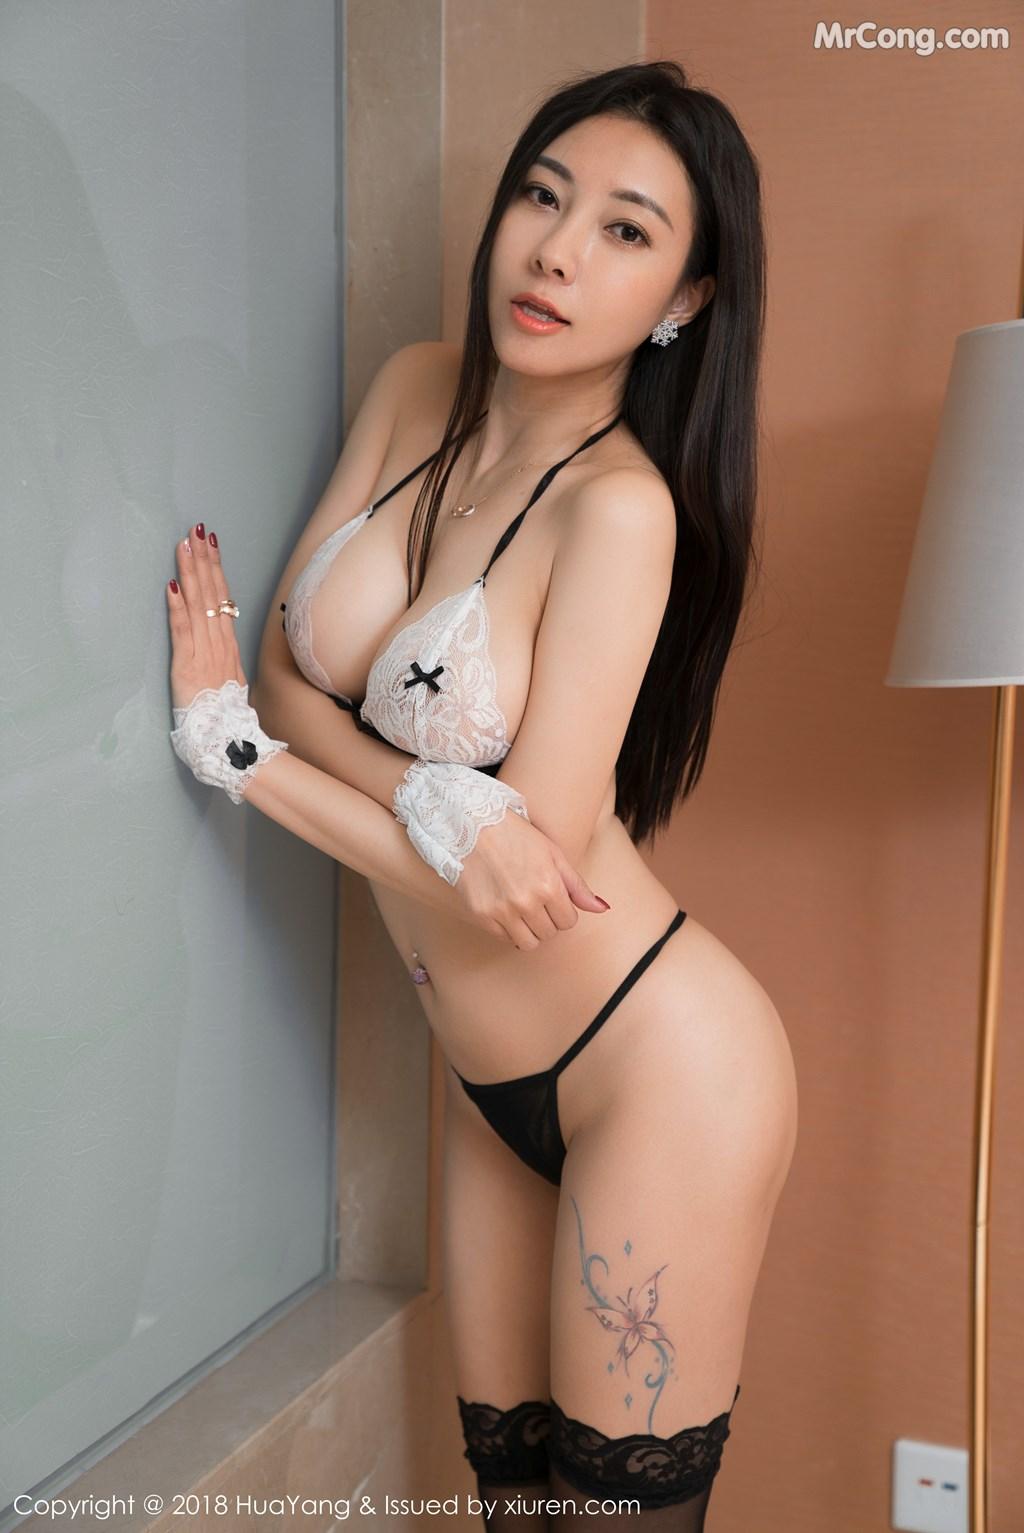 Image HuaYang-2018-01-26-Vol.028-Victoria-Guo-Er-MrCong.com-004 in post HuaYang 2018-01-26 Vol.028: Người mẫu Victoria (果儿) (41 ảnh)